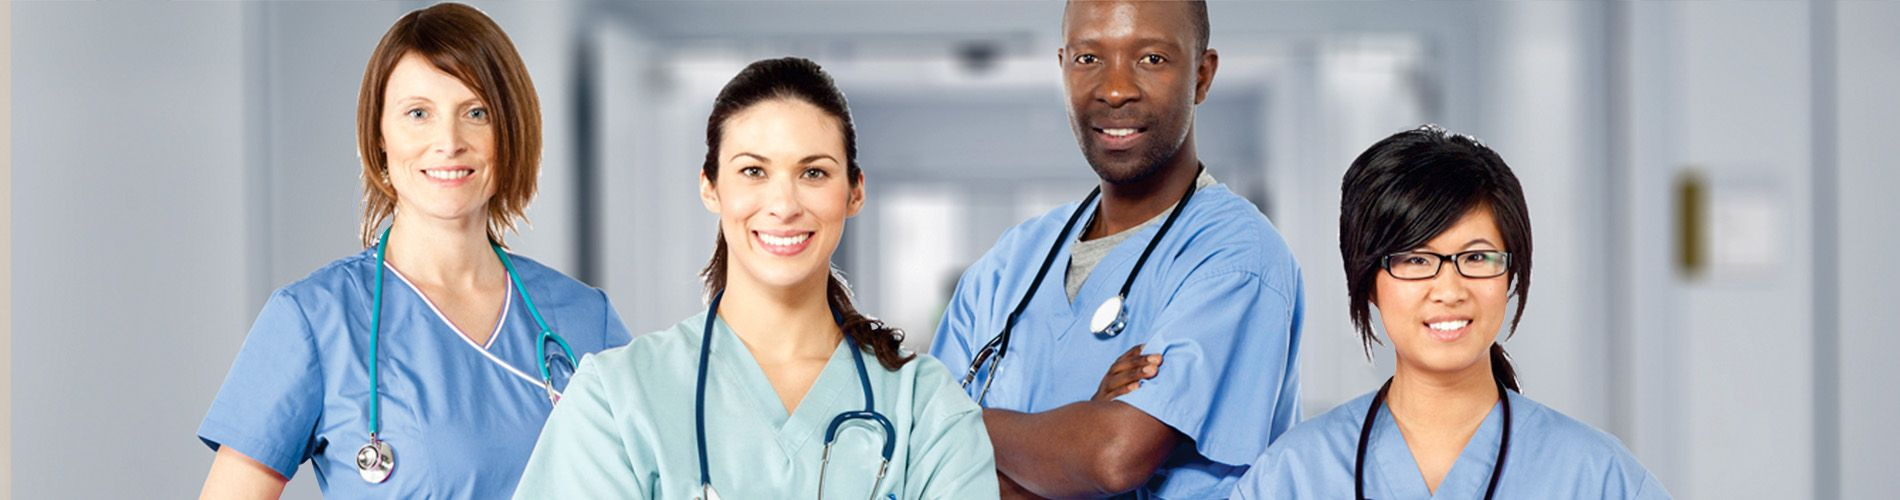 Adevia Health is a boutique healthcare recruitment